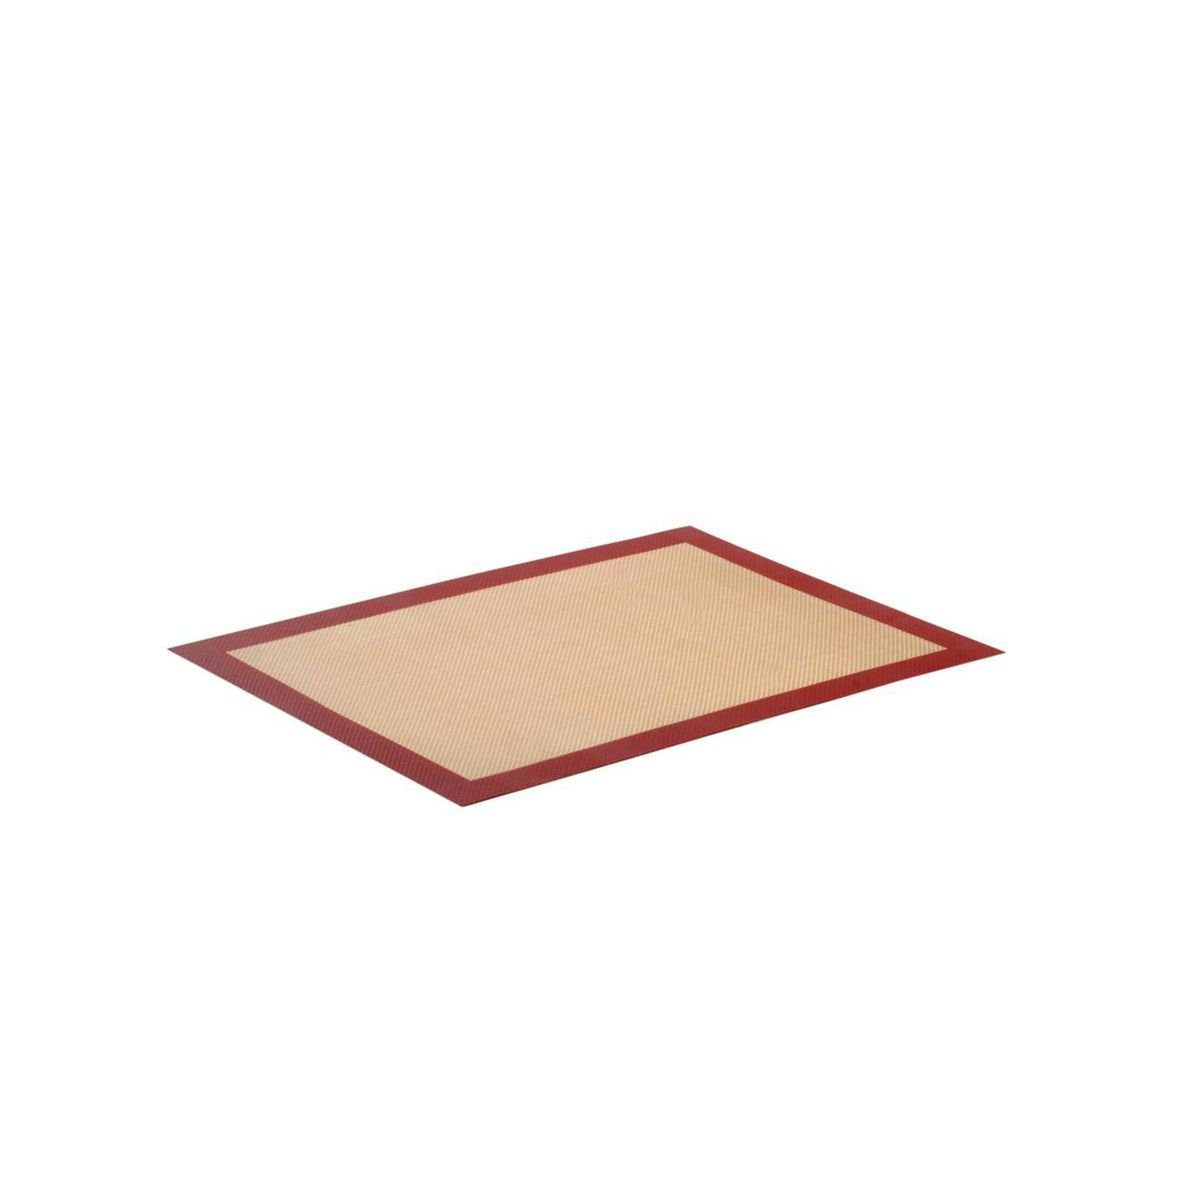 nostik tapis pour patisserie silicone